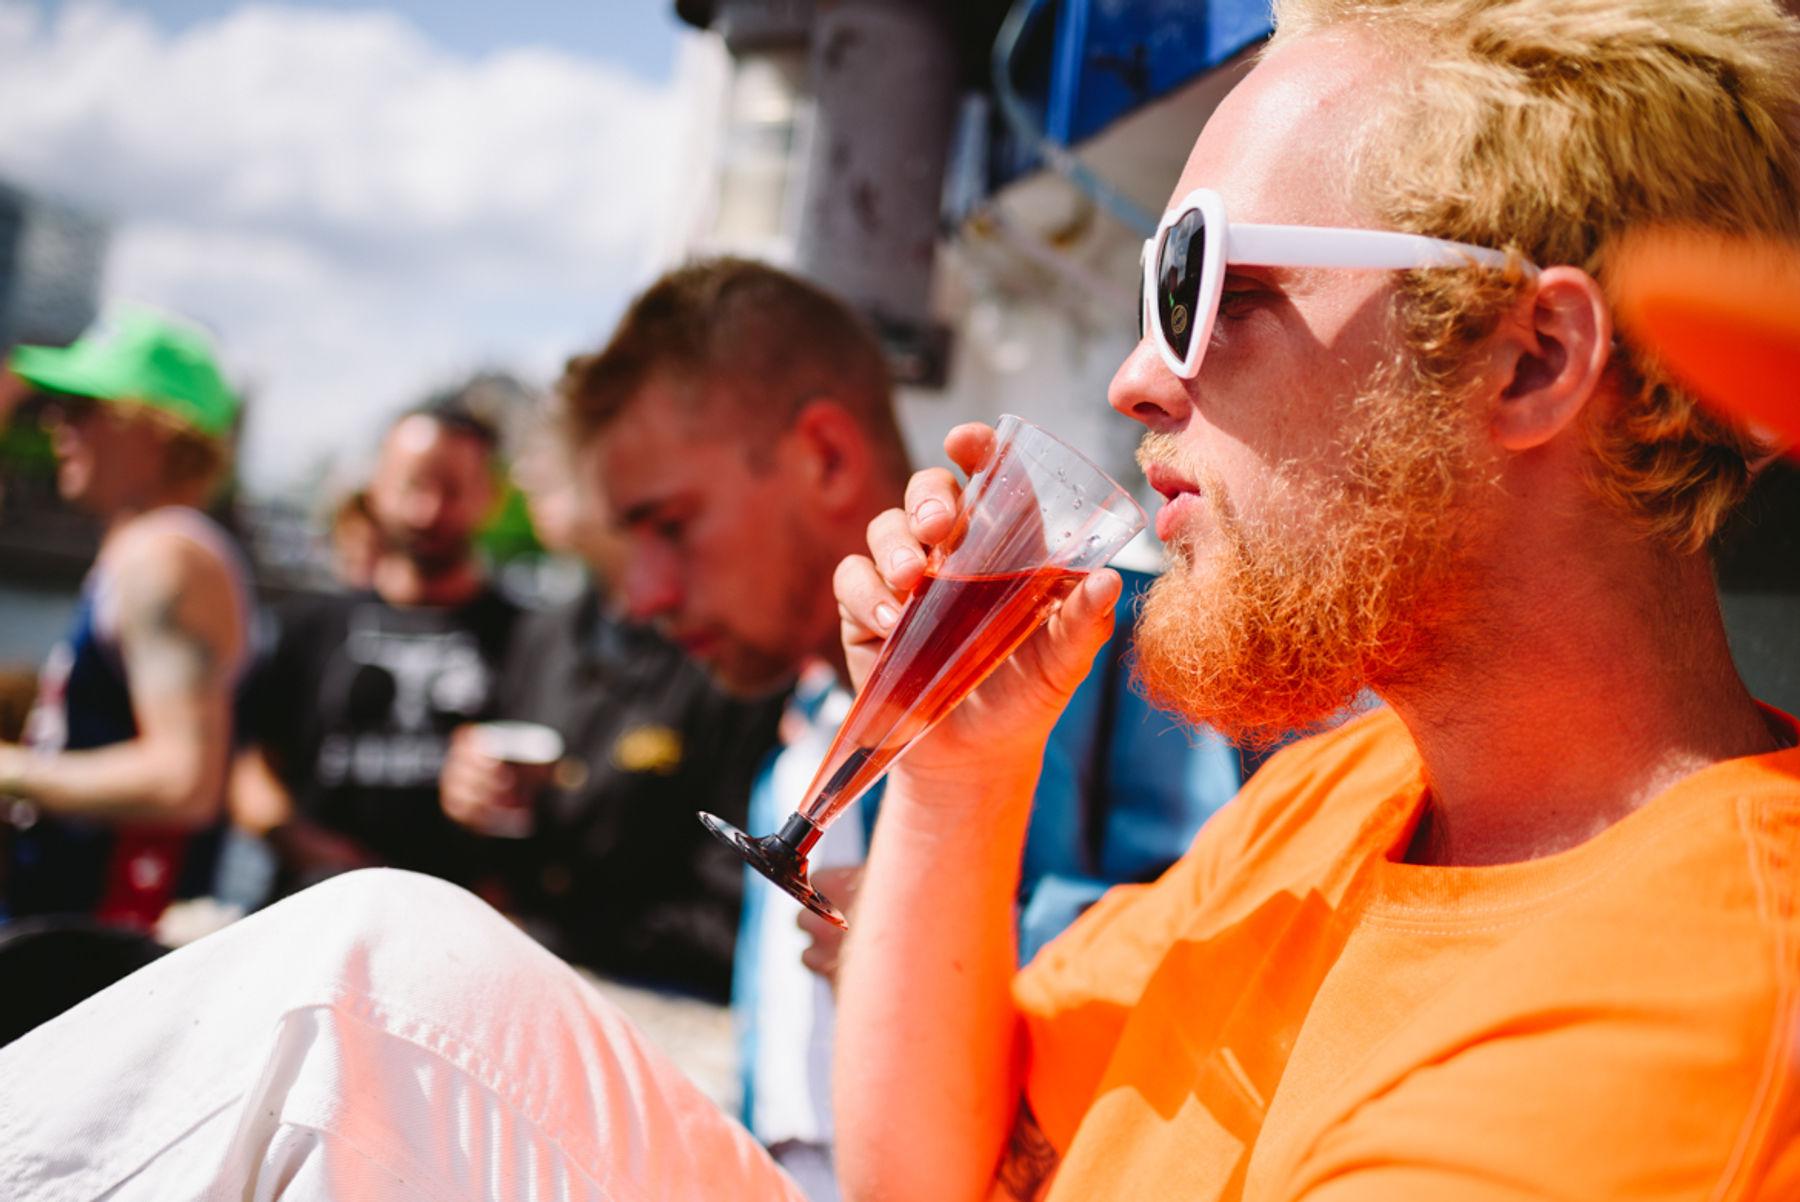 _IHC5593e-Nike-SB-Copenhagen-Open-Day-4-July-2015-Photographer-Maksim-Kalanep